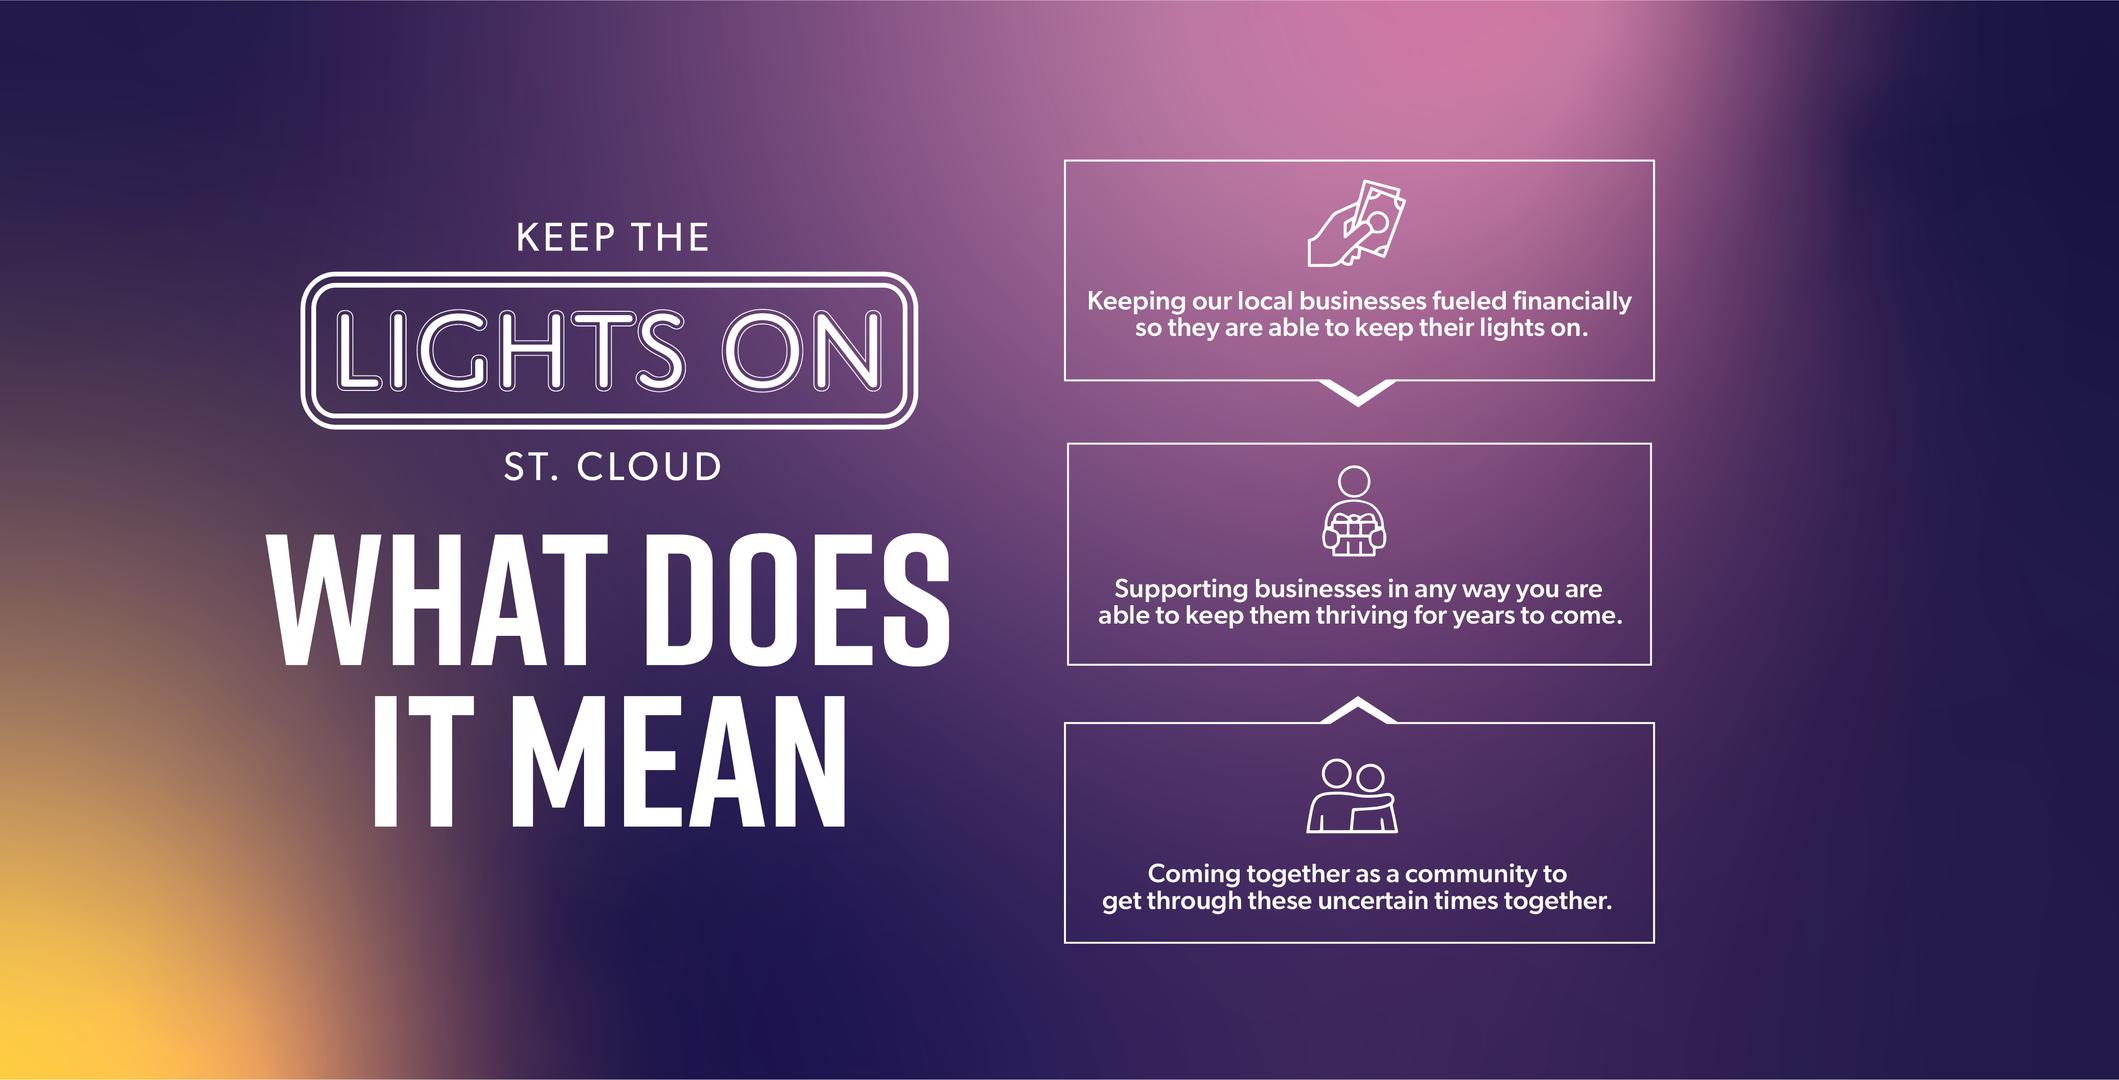 Lights On - Web Infographic Sliders-03.p